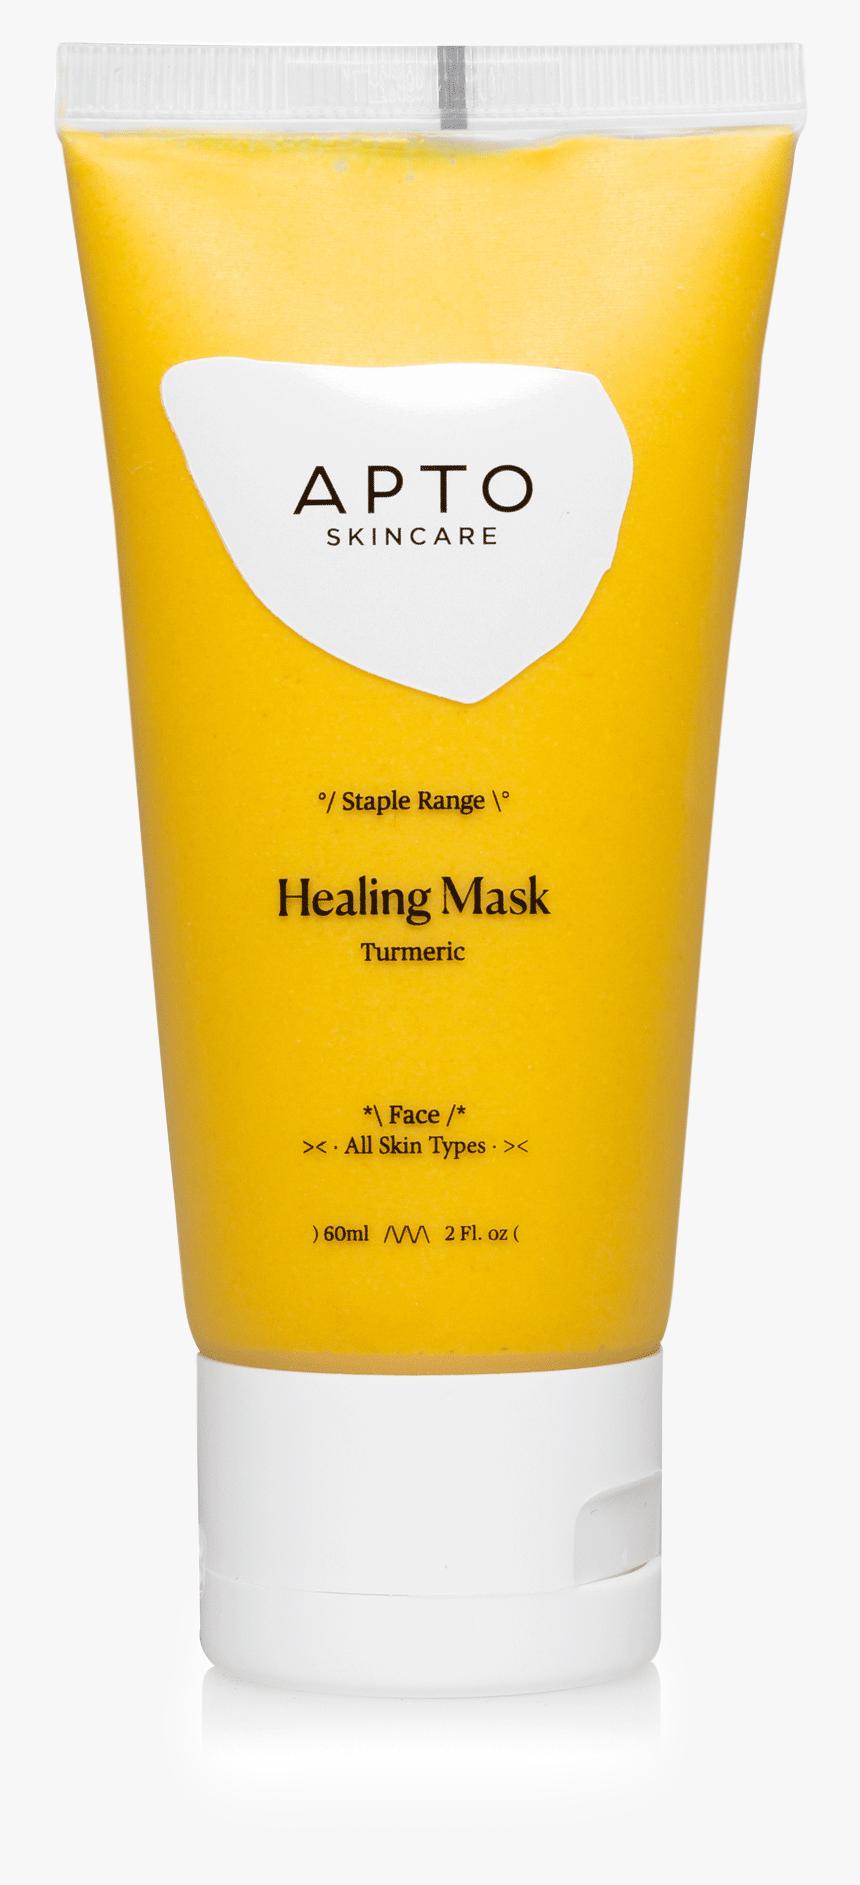 Apto Skincare Healing Turmeric Mask Hd Png Download Kindpng